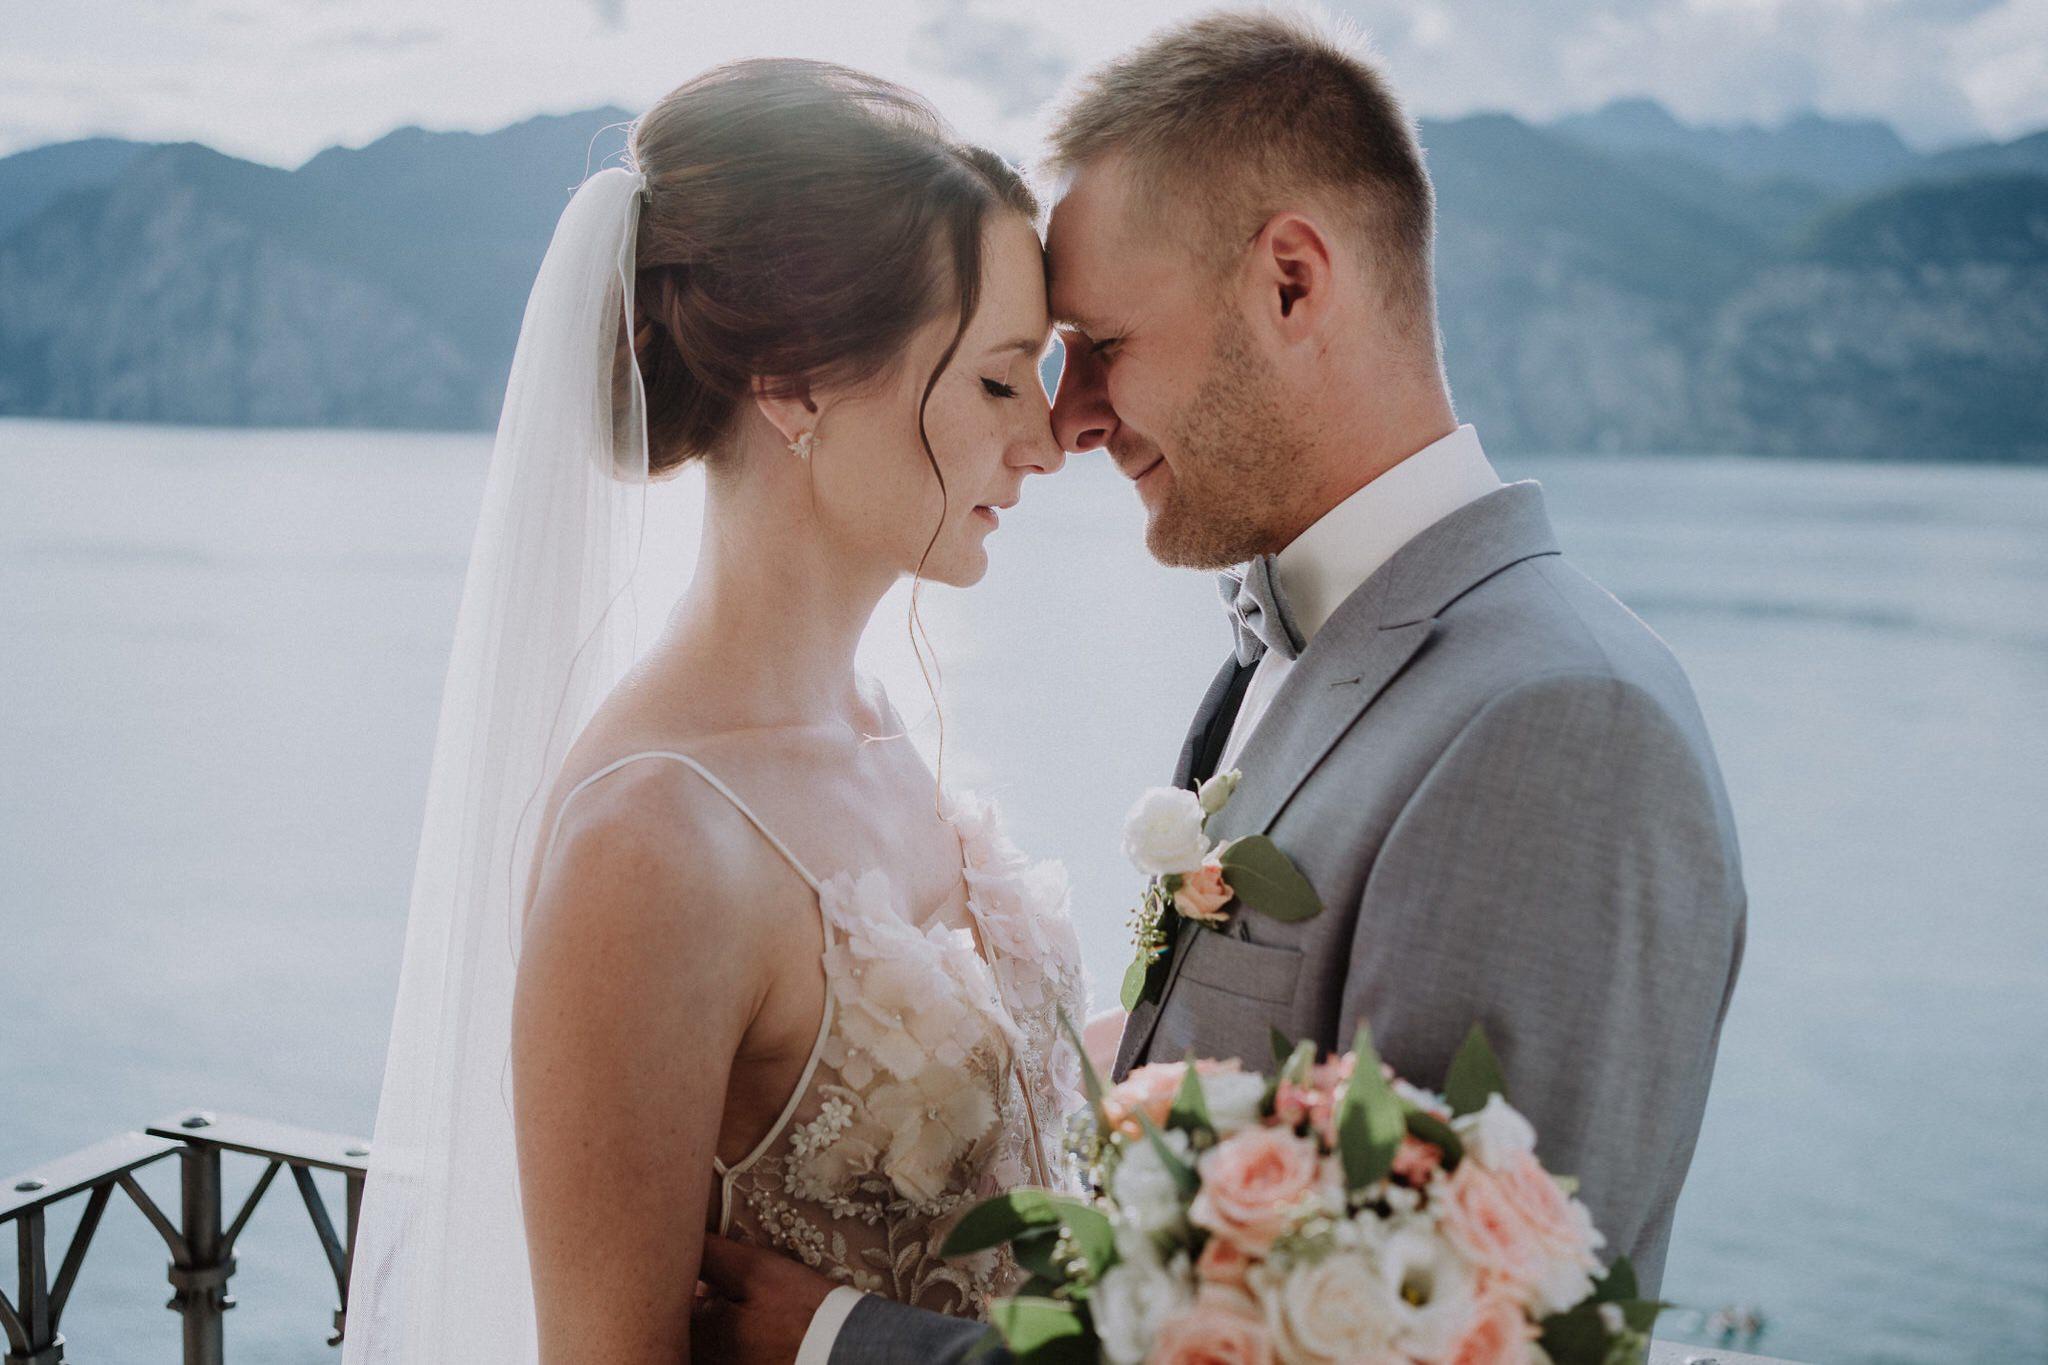 48 la 03 zeremonie 1251 weddinphotographer Hochzeitsfotograf newzealand hamilton Weddingphotography Stuttgart